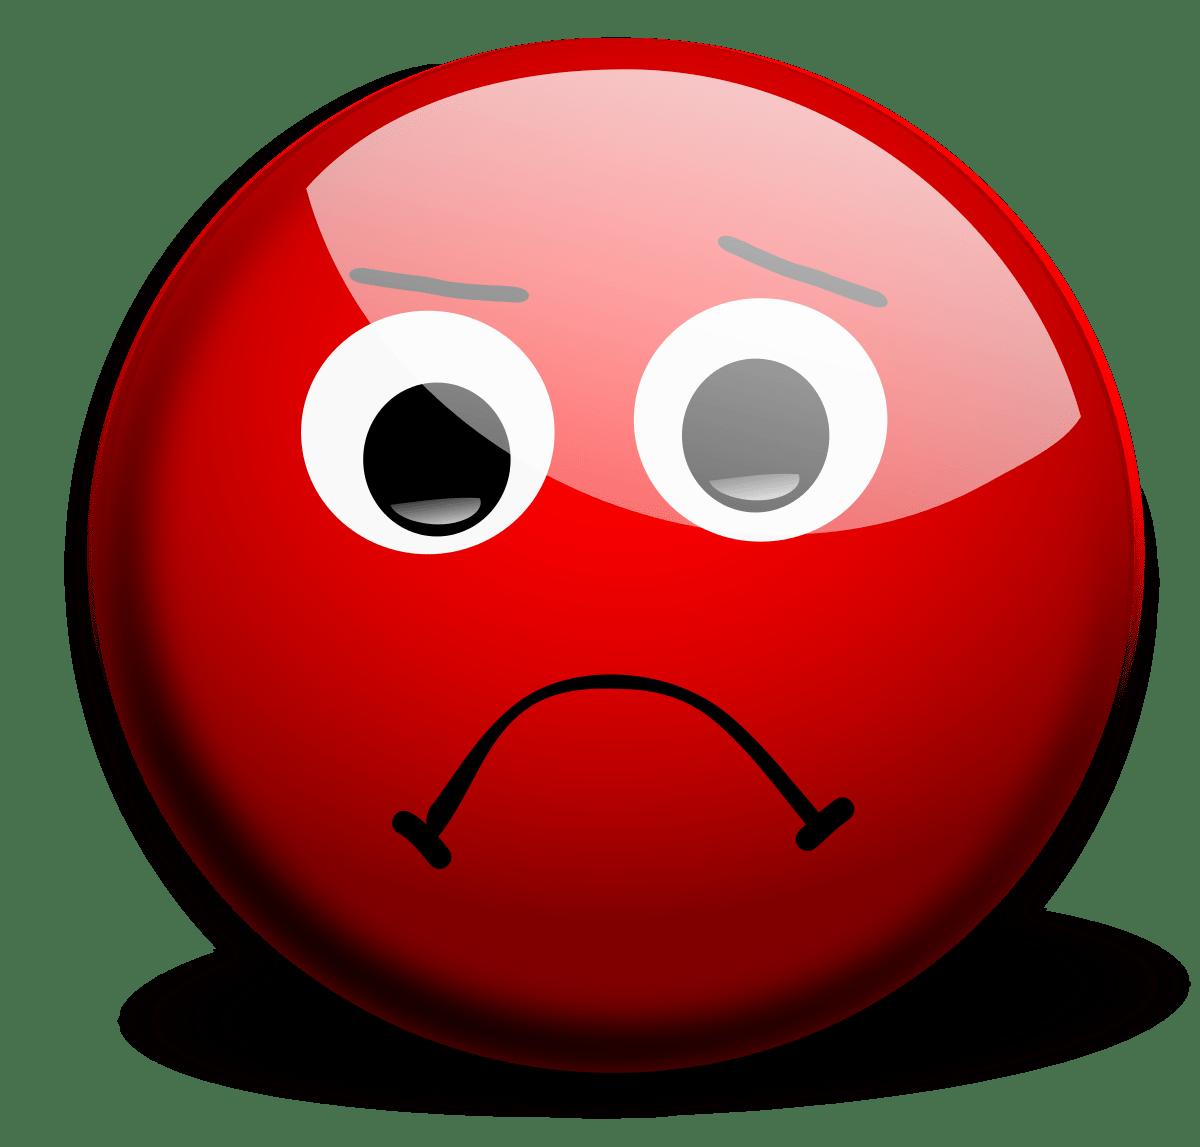 1200x1147 Sad Face Images Clip Art Wallpaper Images